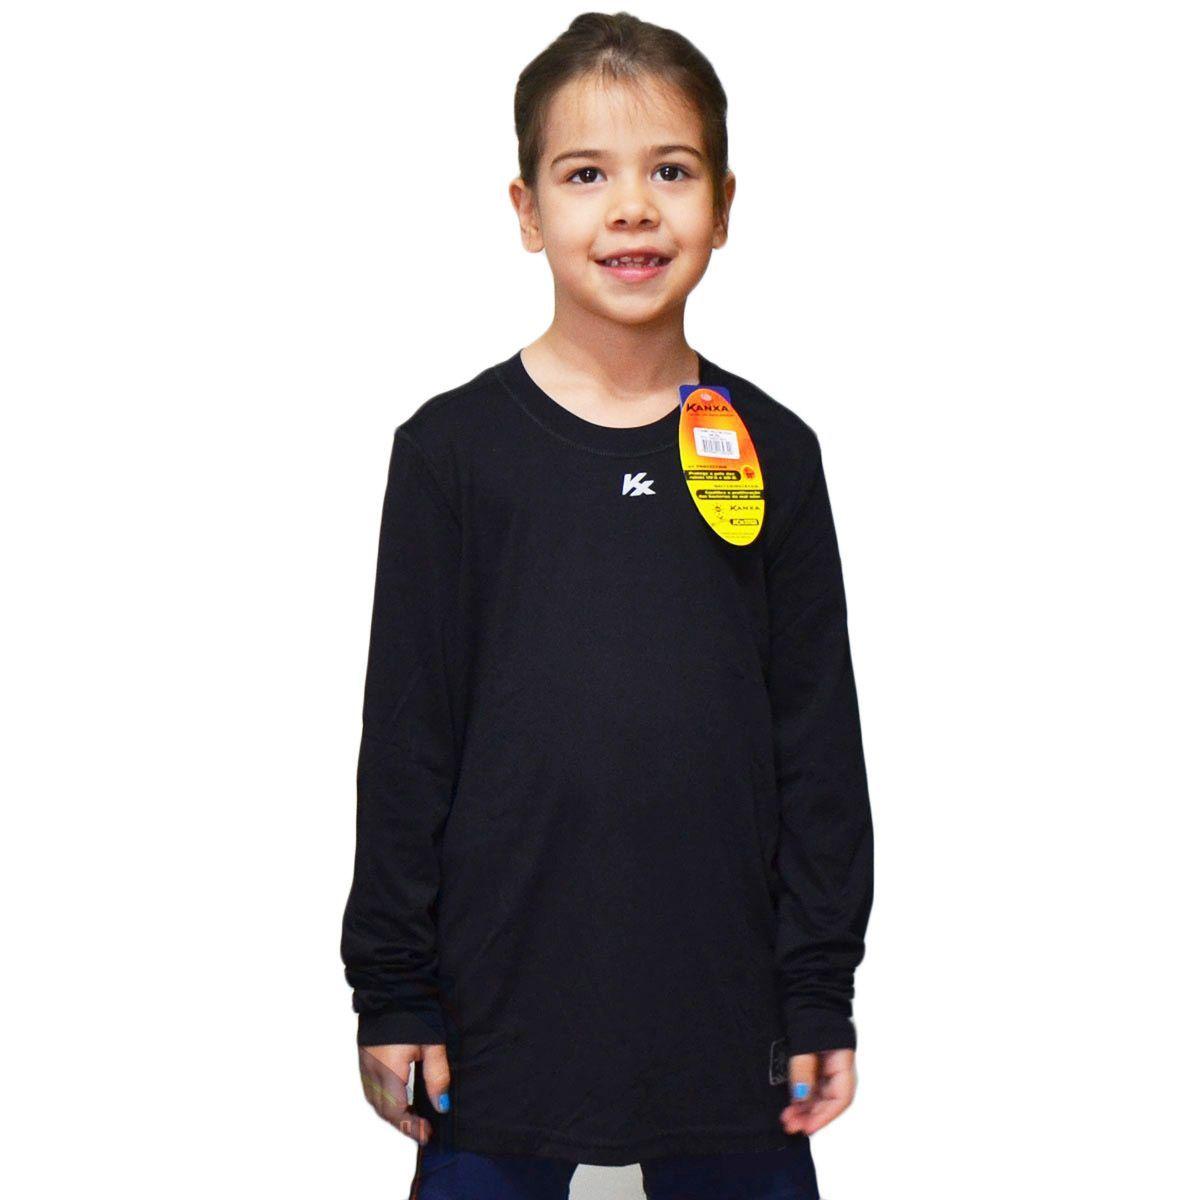 Camisa Térmica Kanxa Infantil Manga Longa Proteção UV